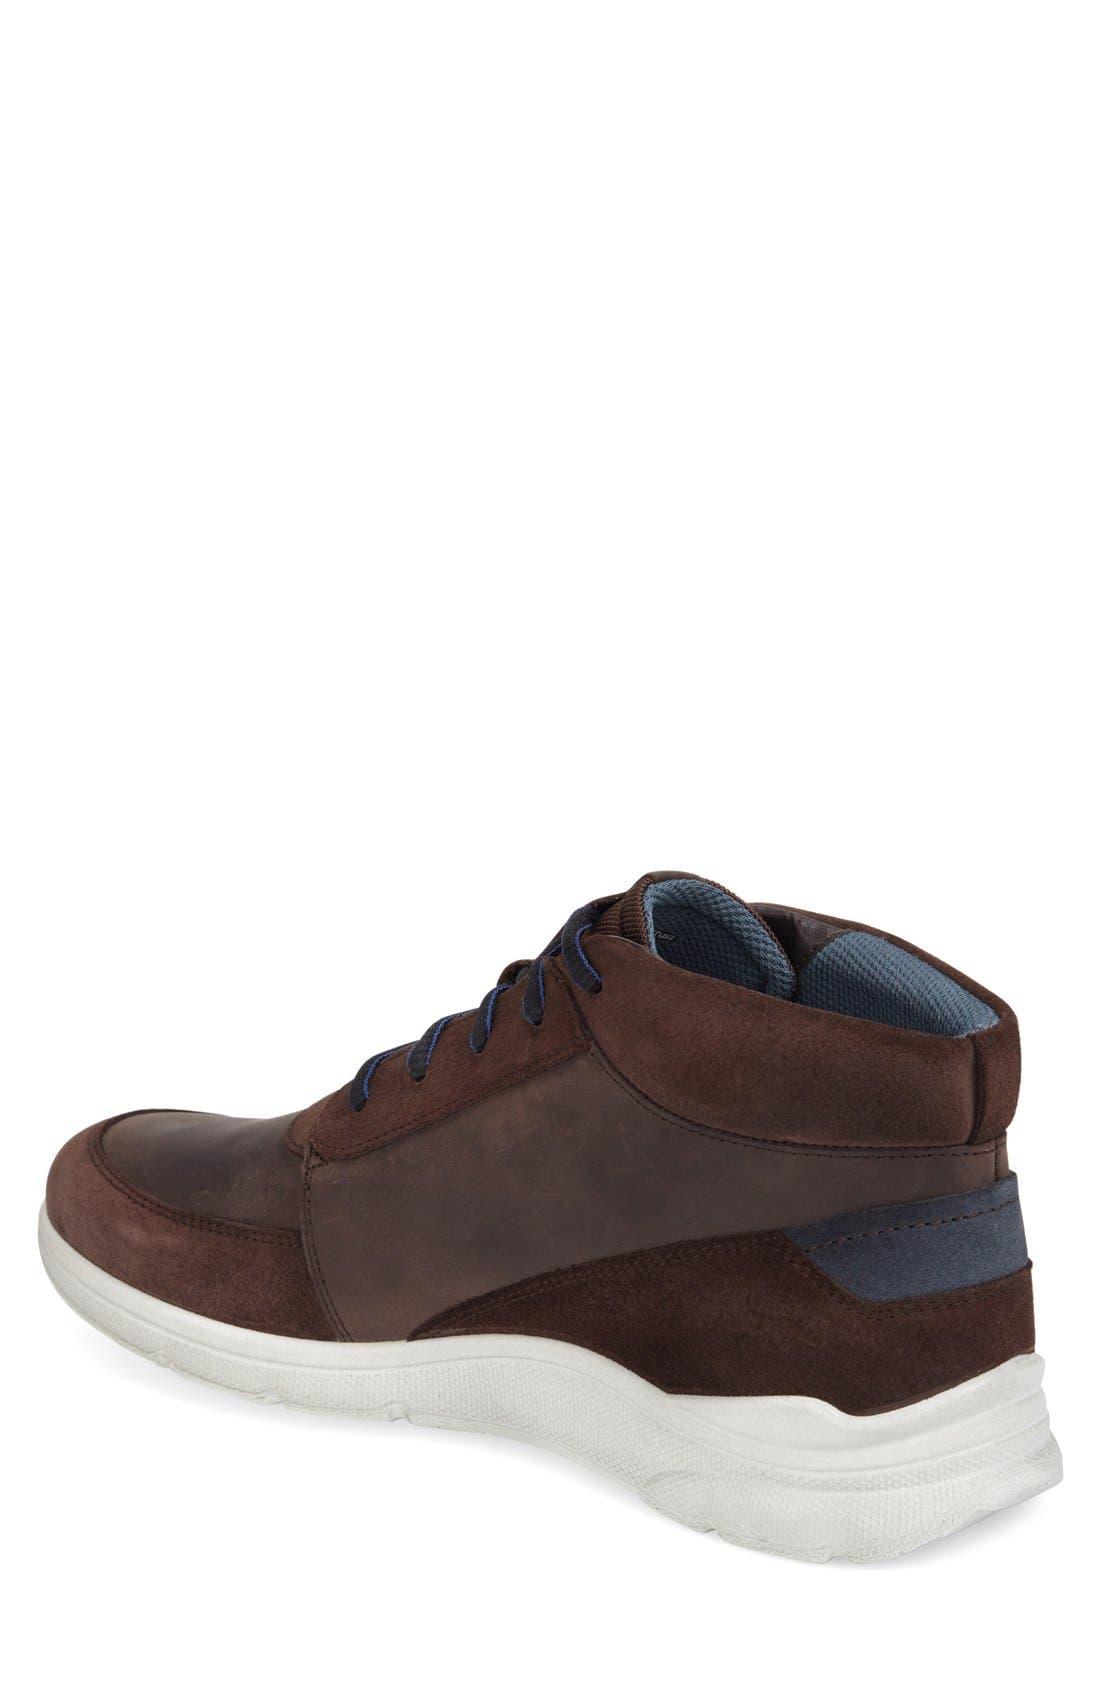 'Irondale Retro' High Top Sneaker,                             Alternate thumbnail 2, color,                             206